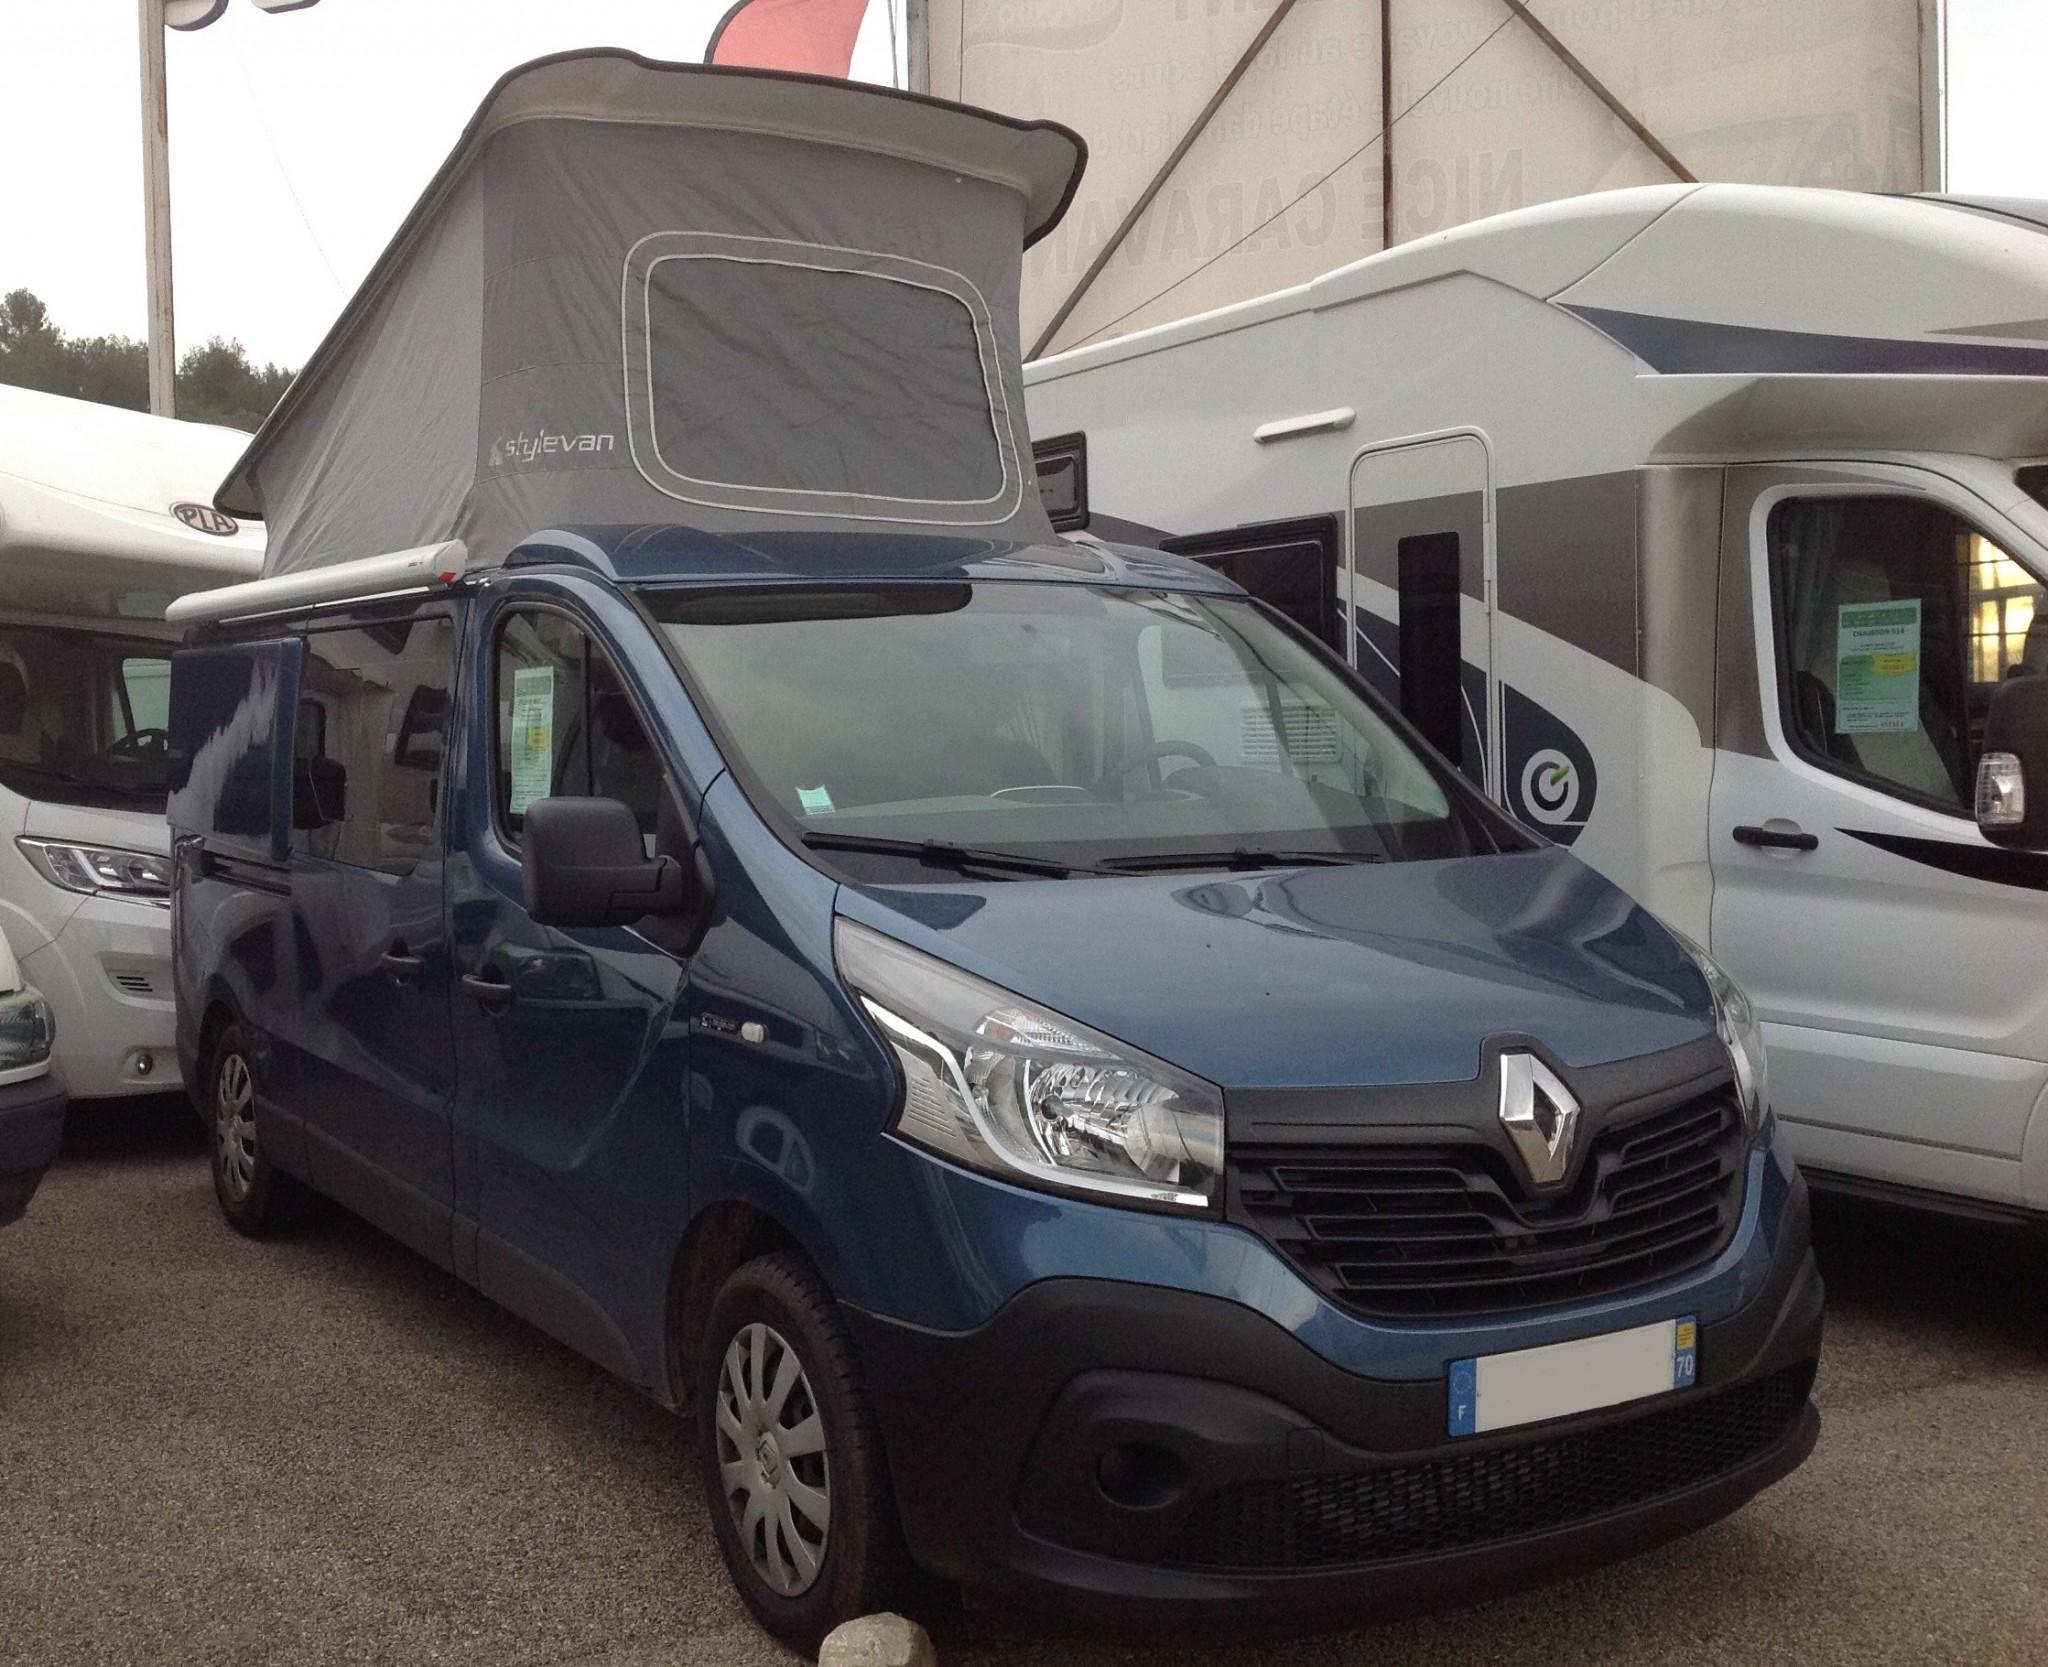 stylevan 4007 occasion porteur renault 125 cv camping car vendre en alpes maritimes 6. Black Bedroom Furniture Sets. Home Design Ideas